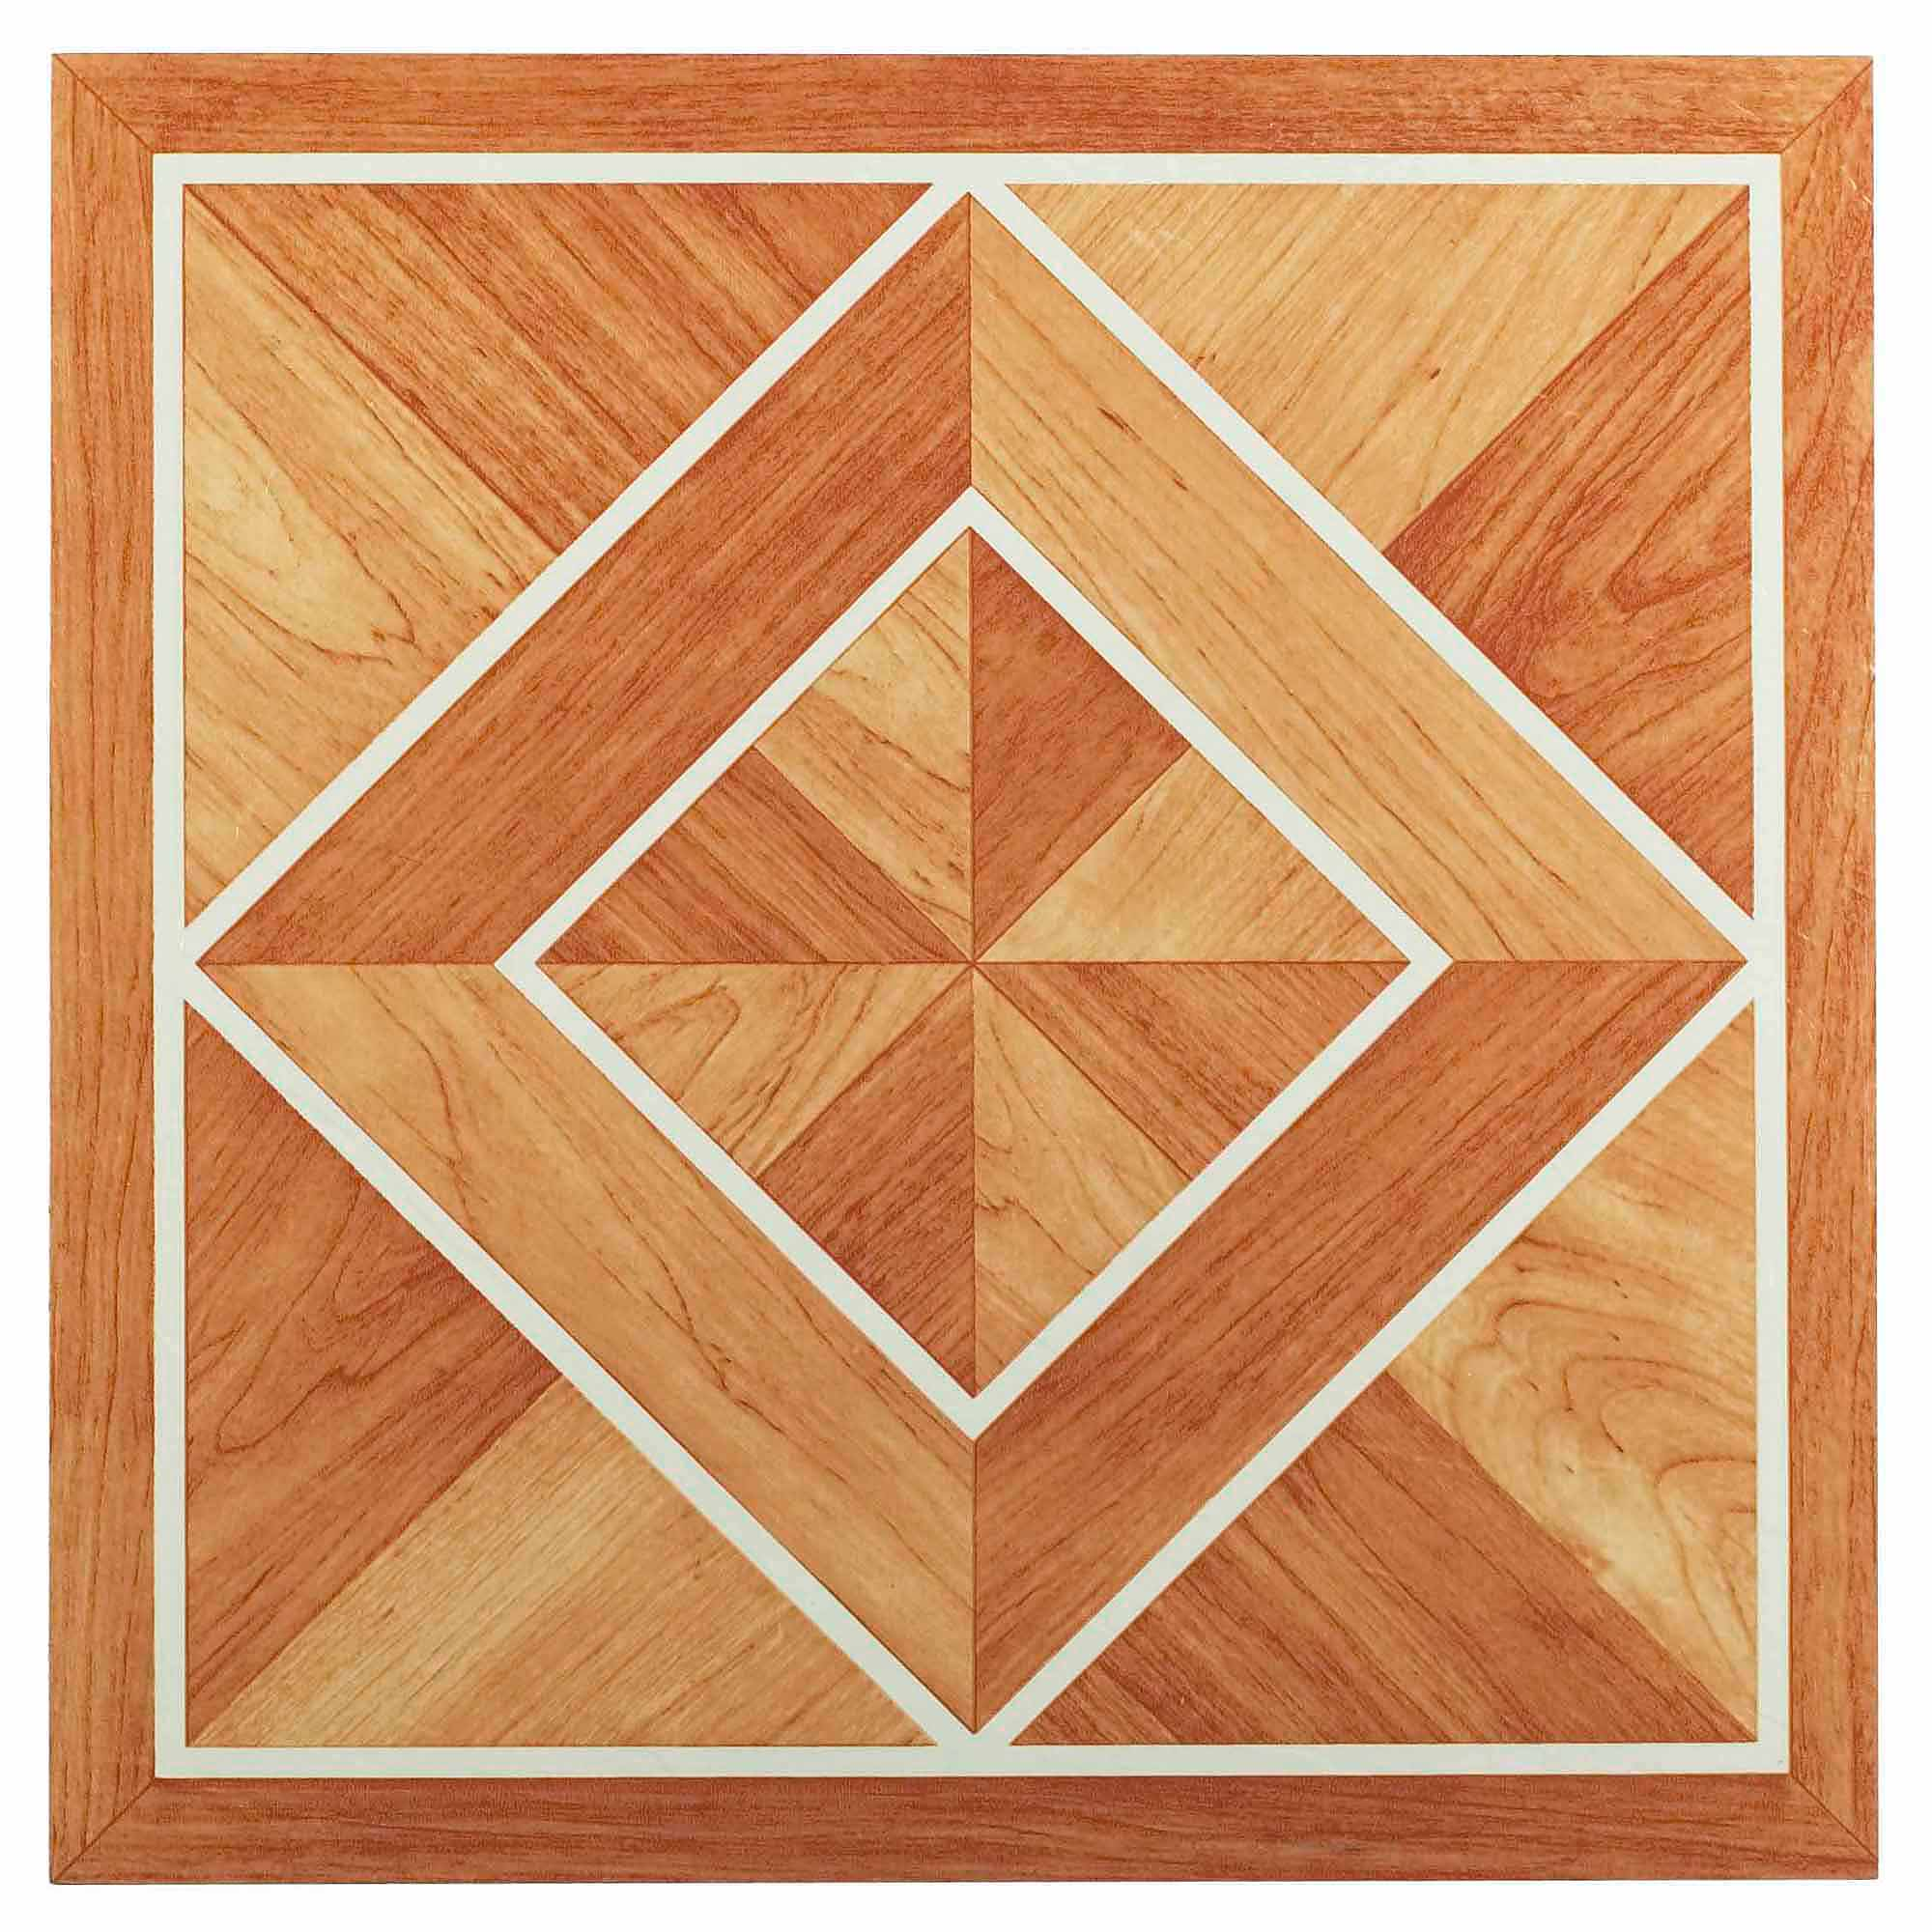 Nexus white border classic inlaid parquet 12x12 inch self adhesive nexus white border classic inlaid parquet 12x12 inch self adhesive vinyl floor tile 20 tiles20 sqft walmart dailygadgetfo Images